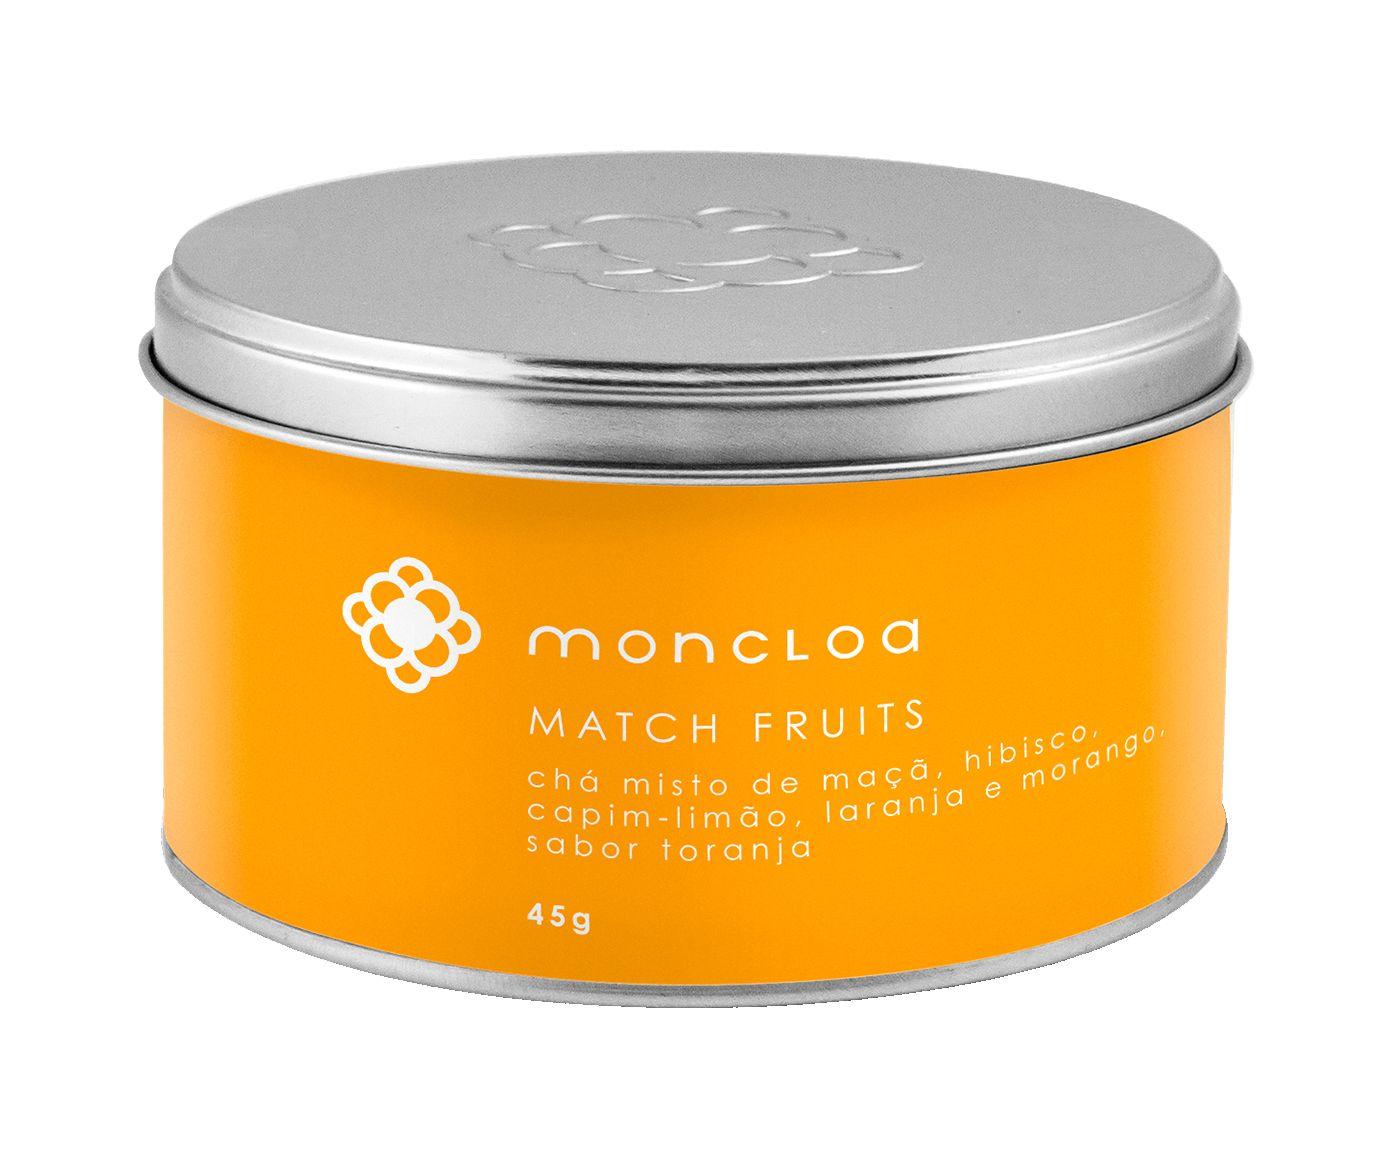 Chá Match Fruits - 45G | Westwing.com.br